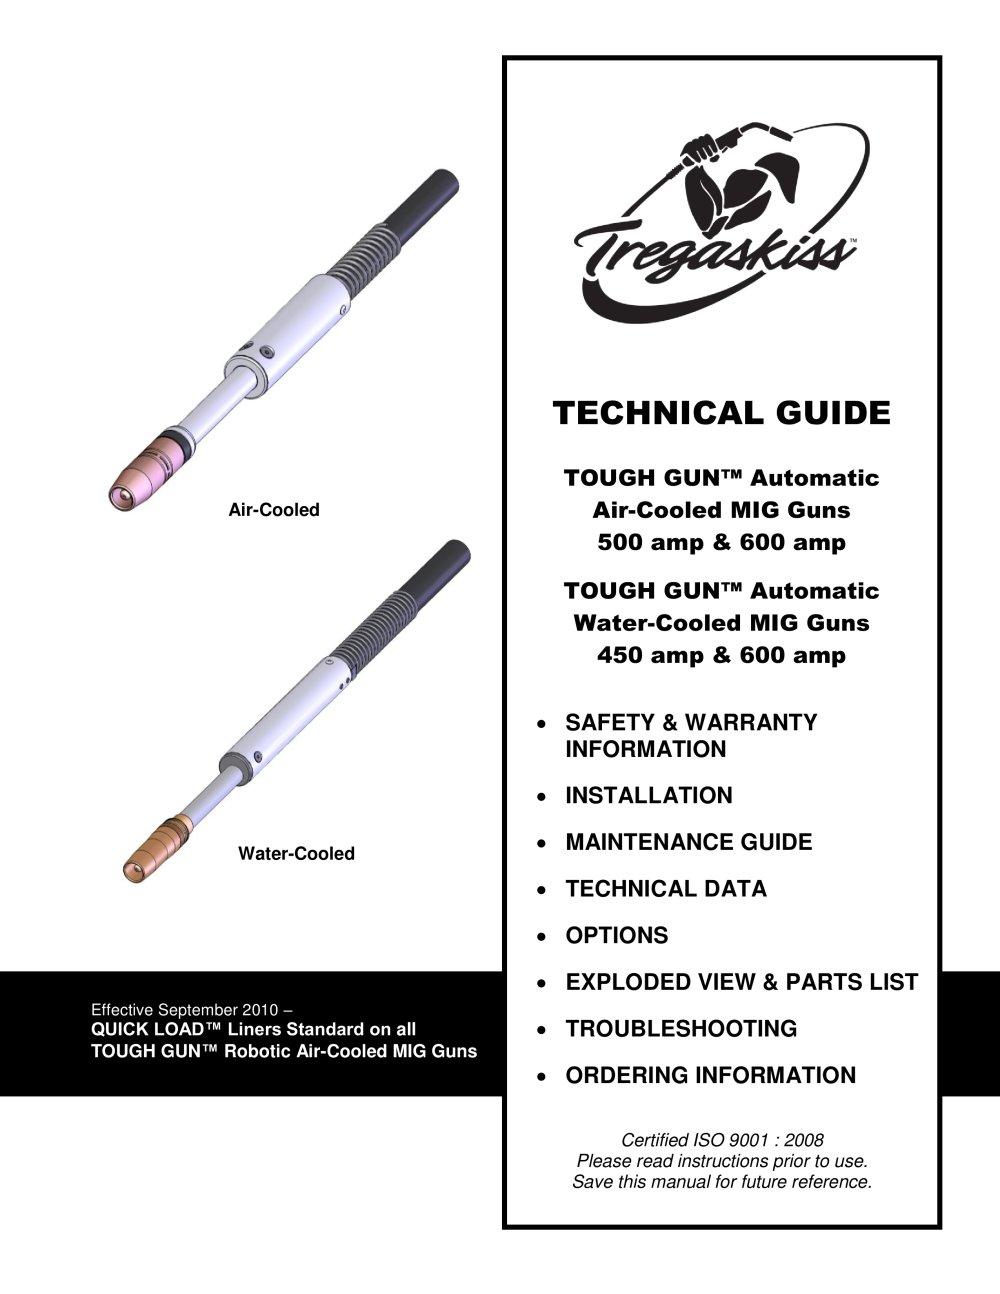 TOUGH GUN Automatic MIG Guns Owner's Manual - 1 / 16 Pages